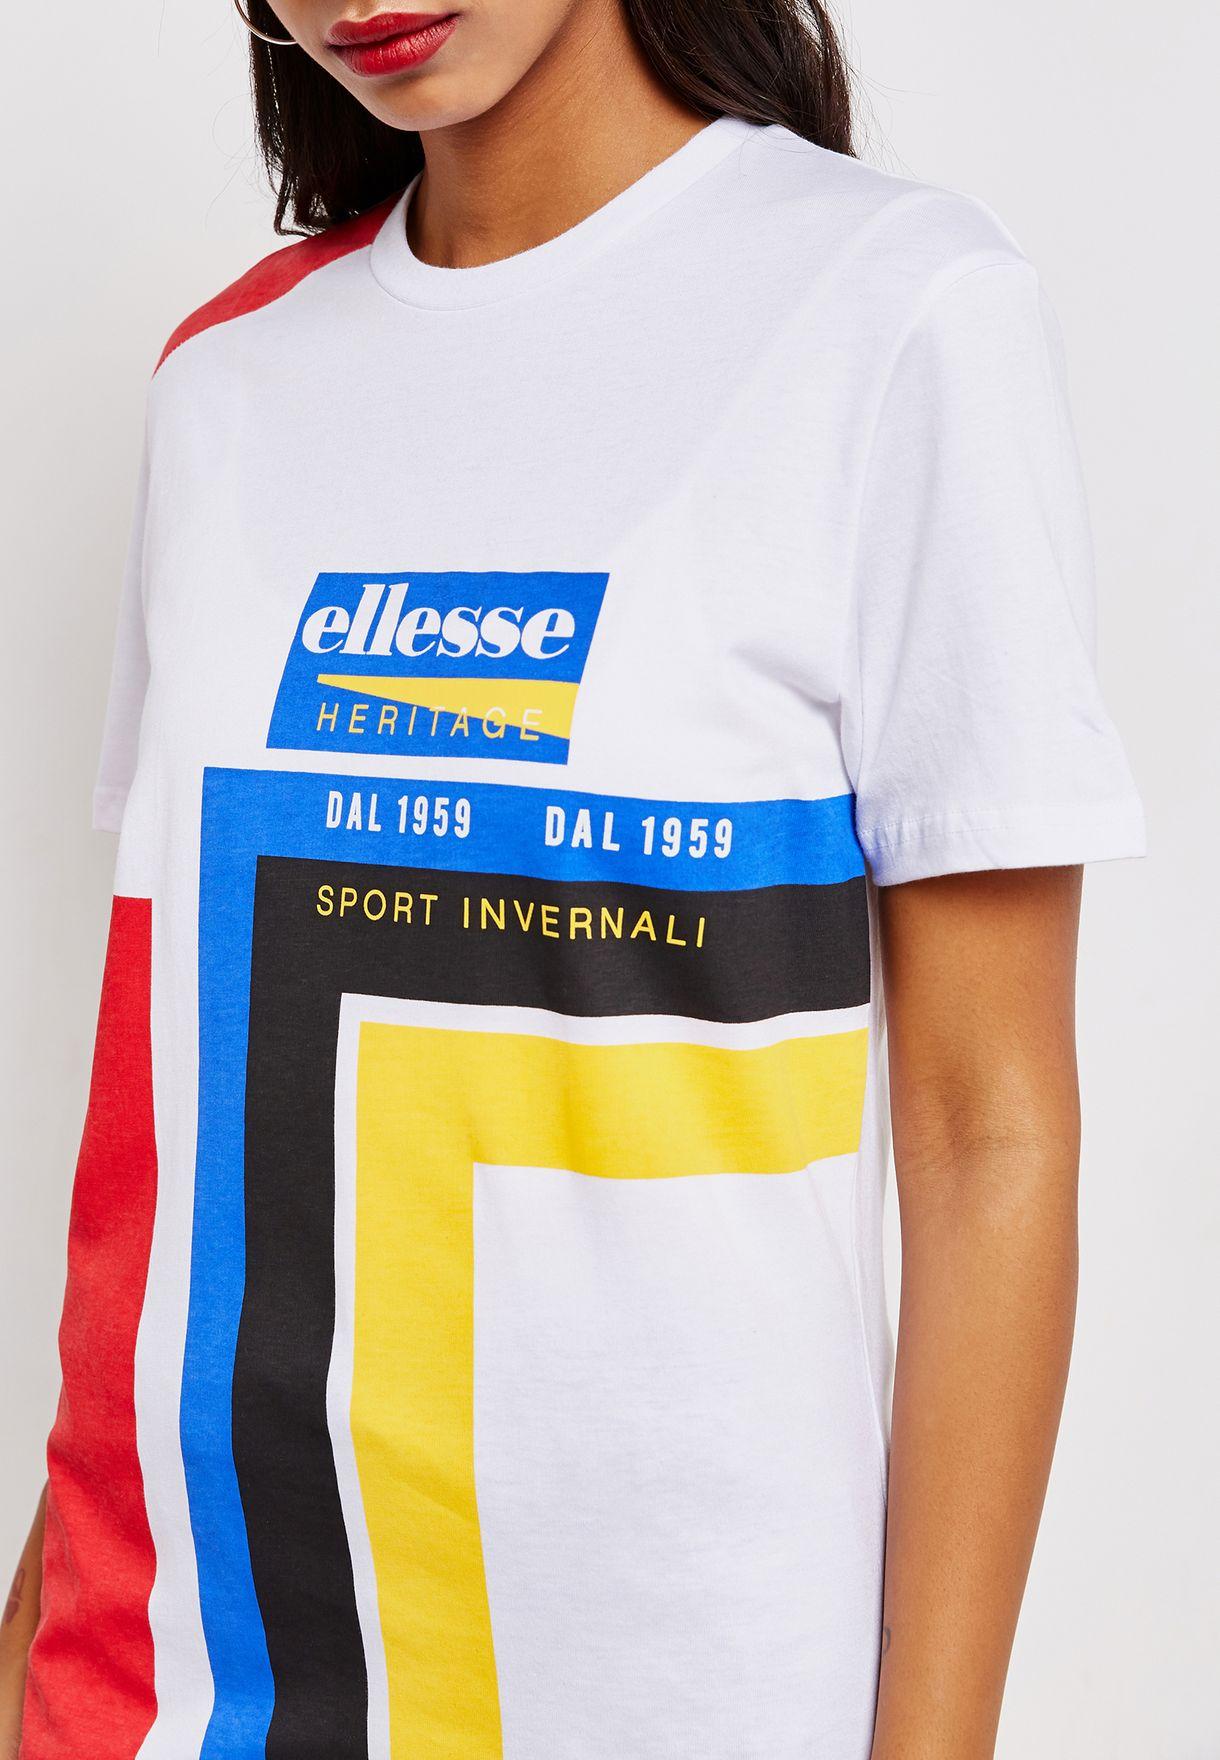 Giovo T-Shirt